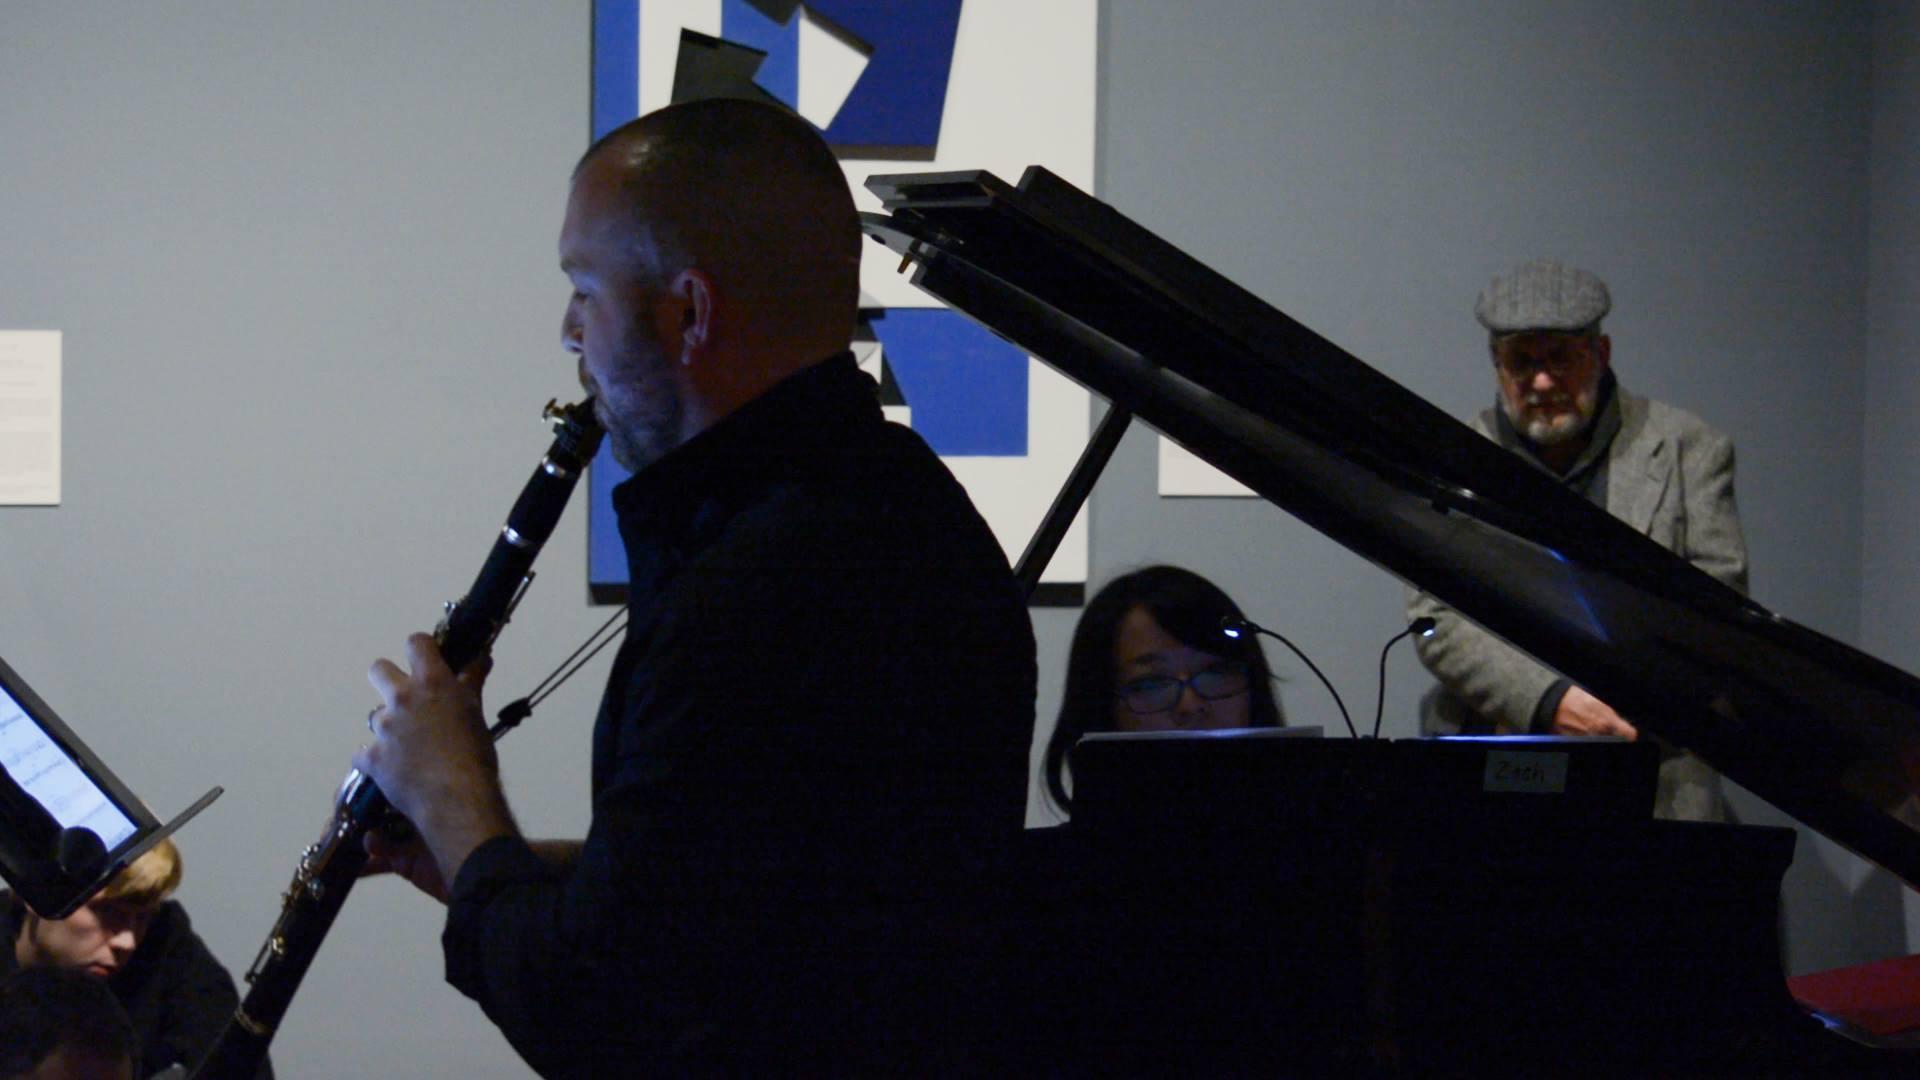 Performing Michael Finnissy's  Clarinet Sonata with Michiko Saiki @Toledo Museum of Art's collaboration with BGSU's Contemporary Doctoral Program, EAR | EYE (2015)